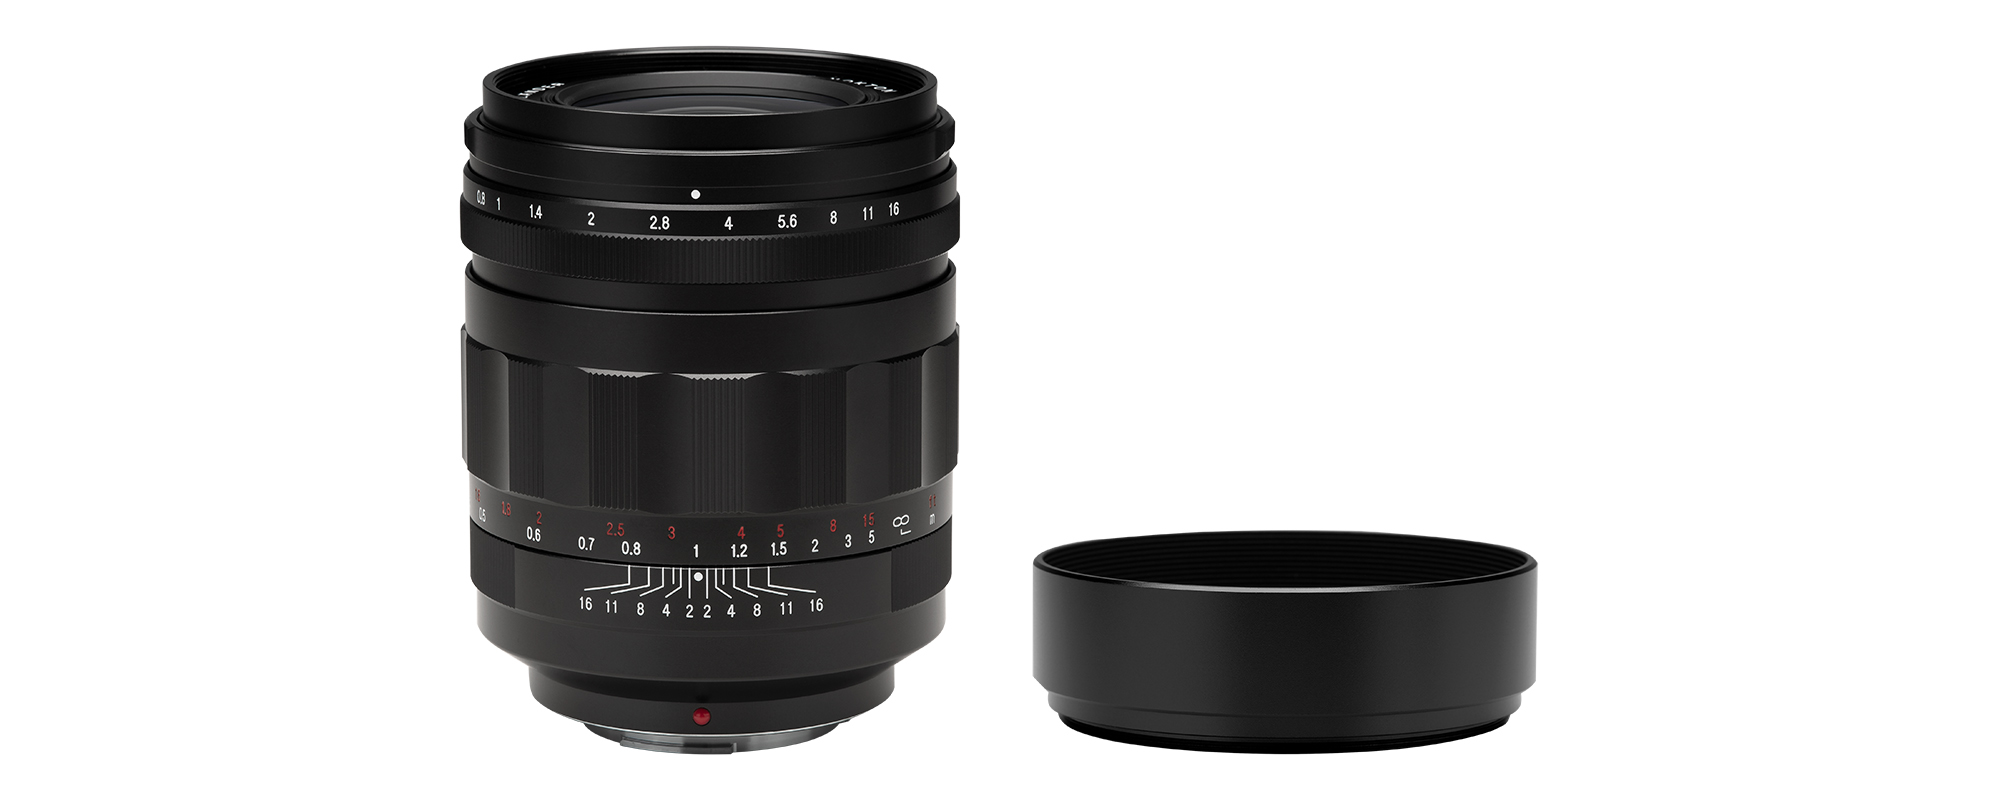 Voigtlander Super Nokton 29mm f/0.8 lens for Micro 4/3